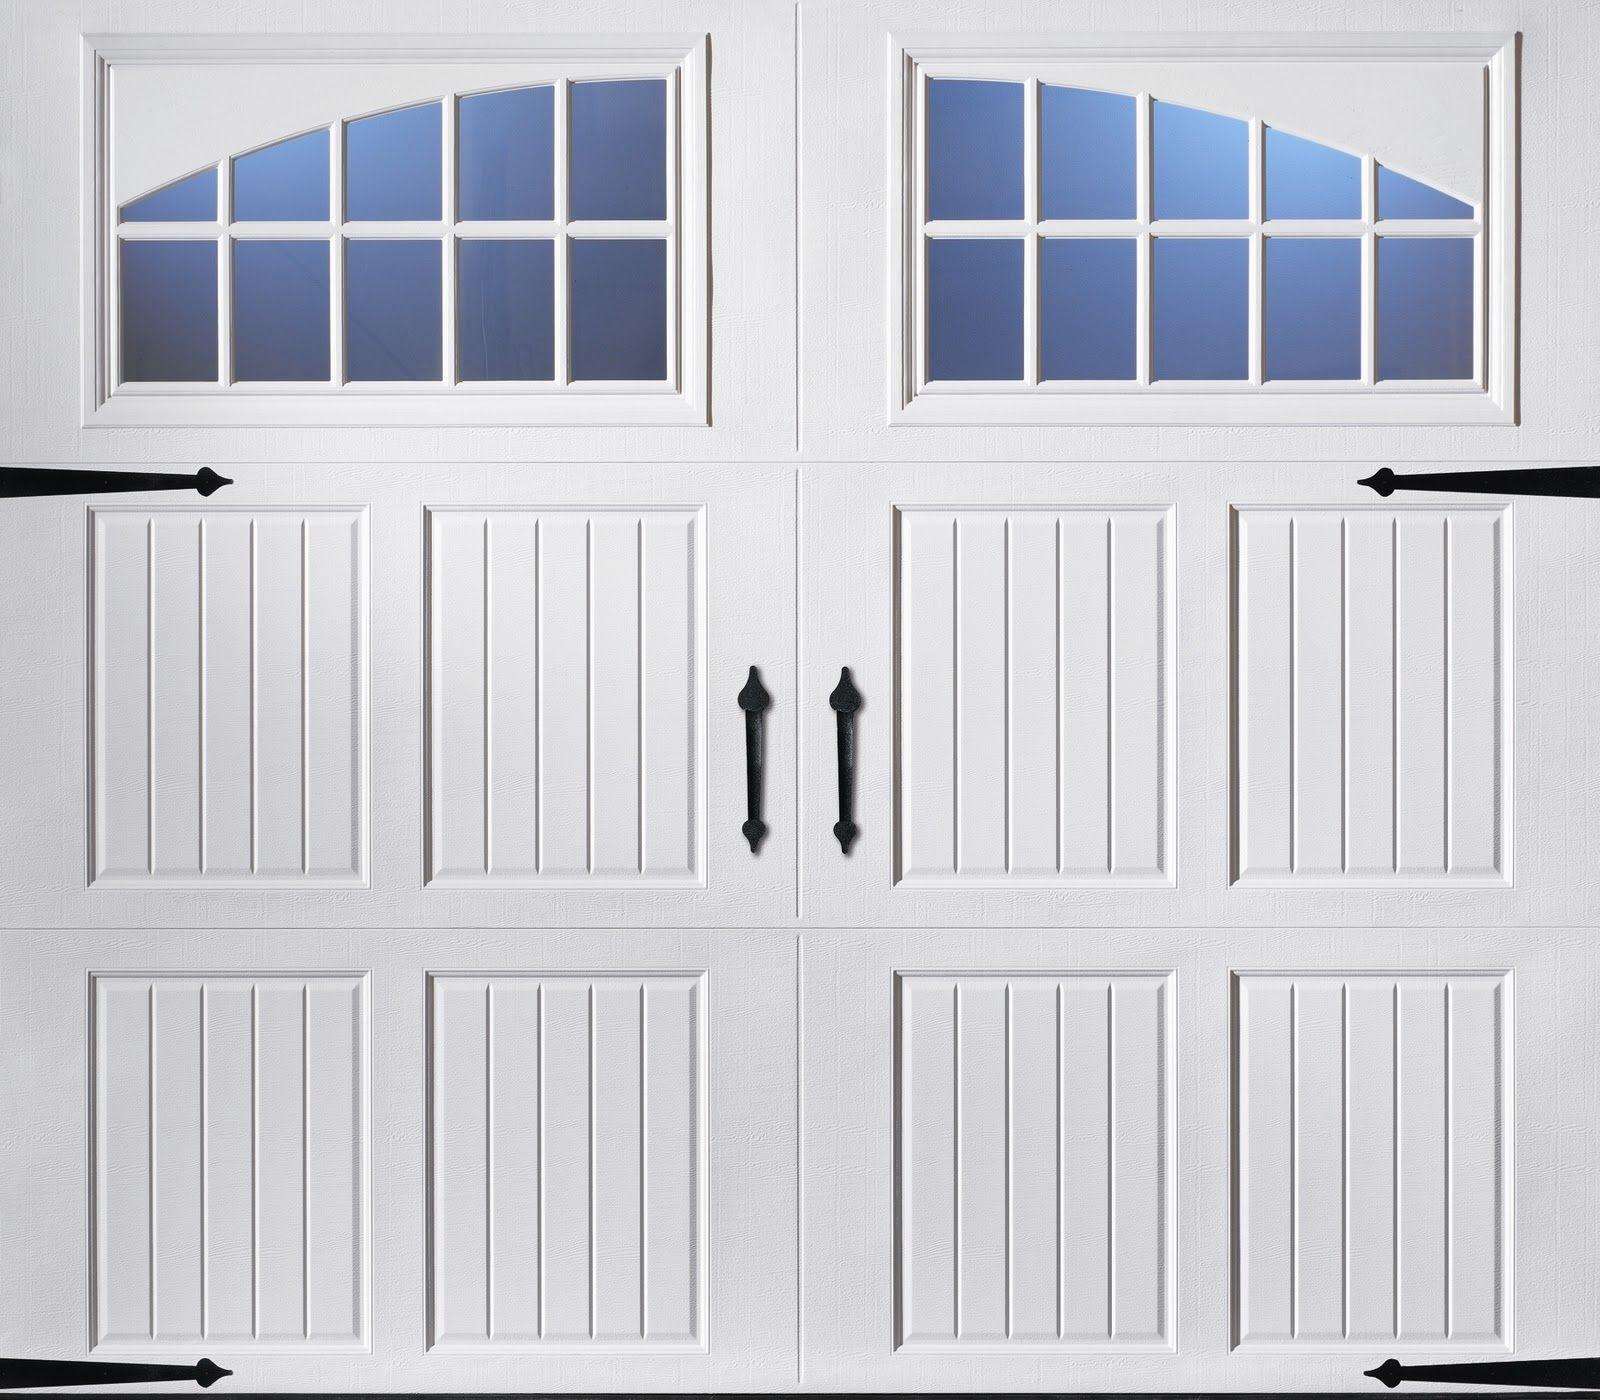 From Http Doors4u Blogspot Com 2011 10 Carriage House Door Specialist Html Carriage House Garage Doors Carriage House Doors Garage Door Design